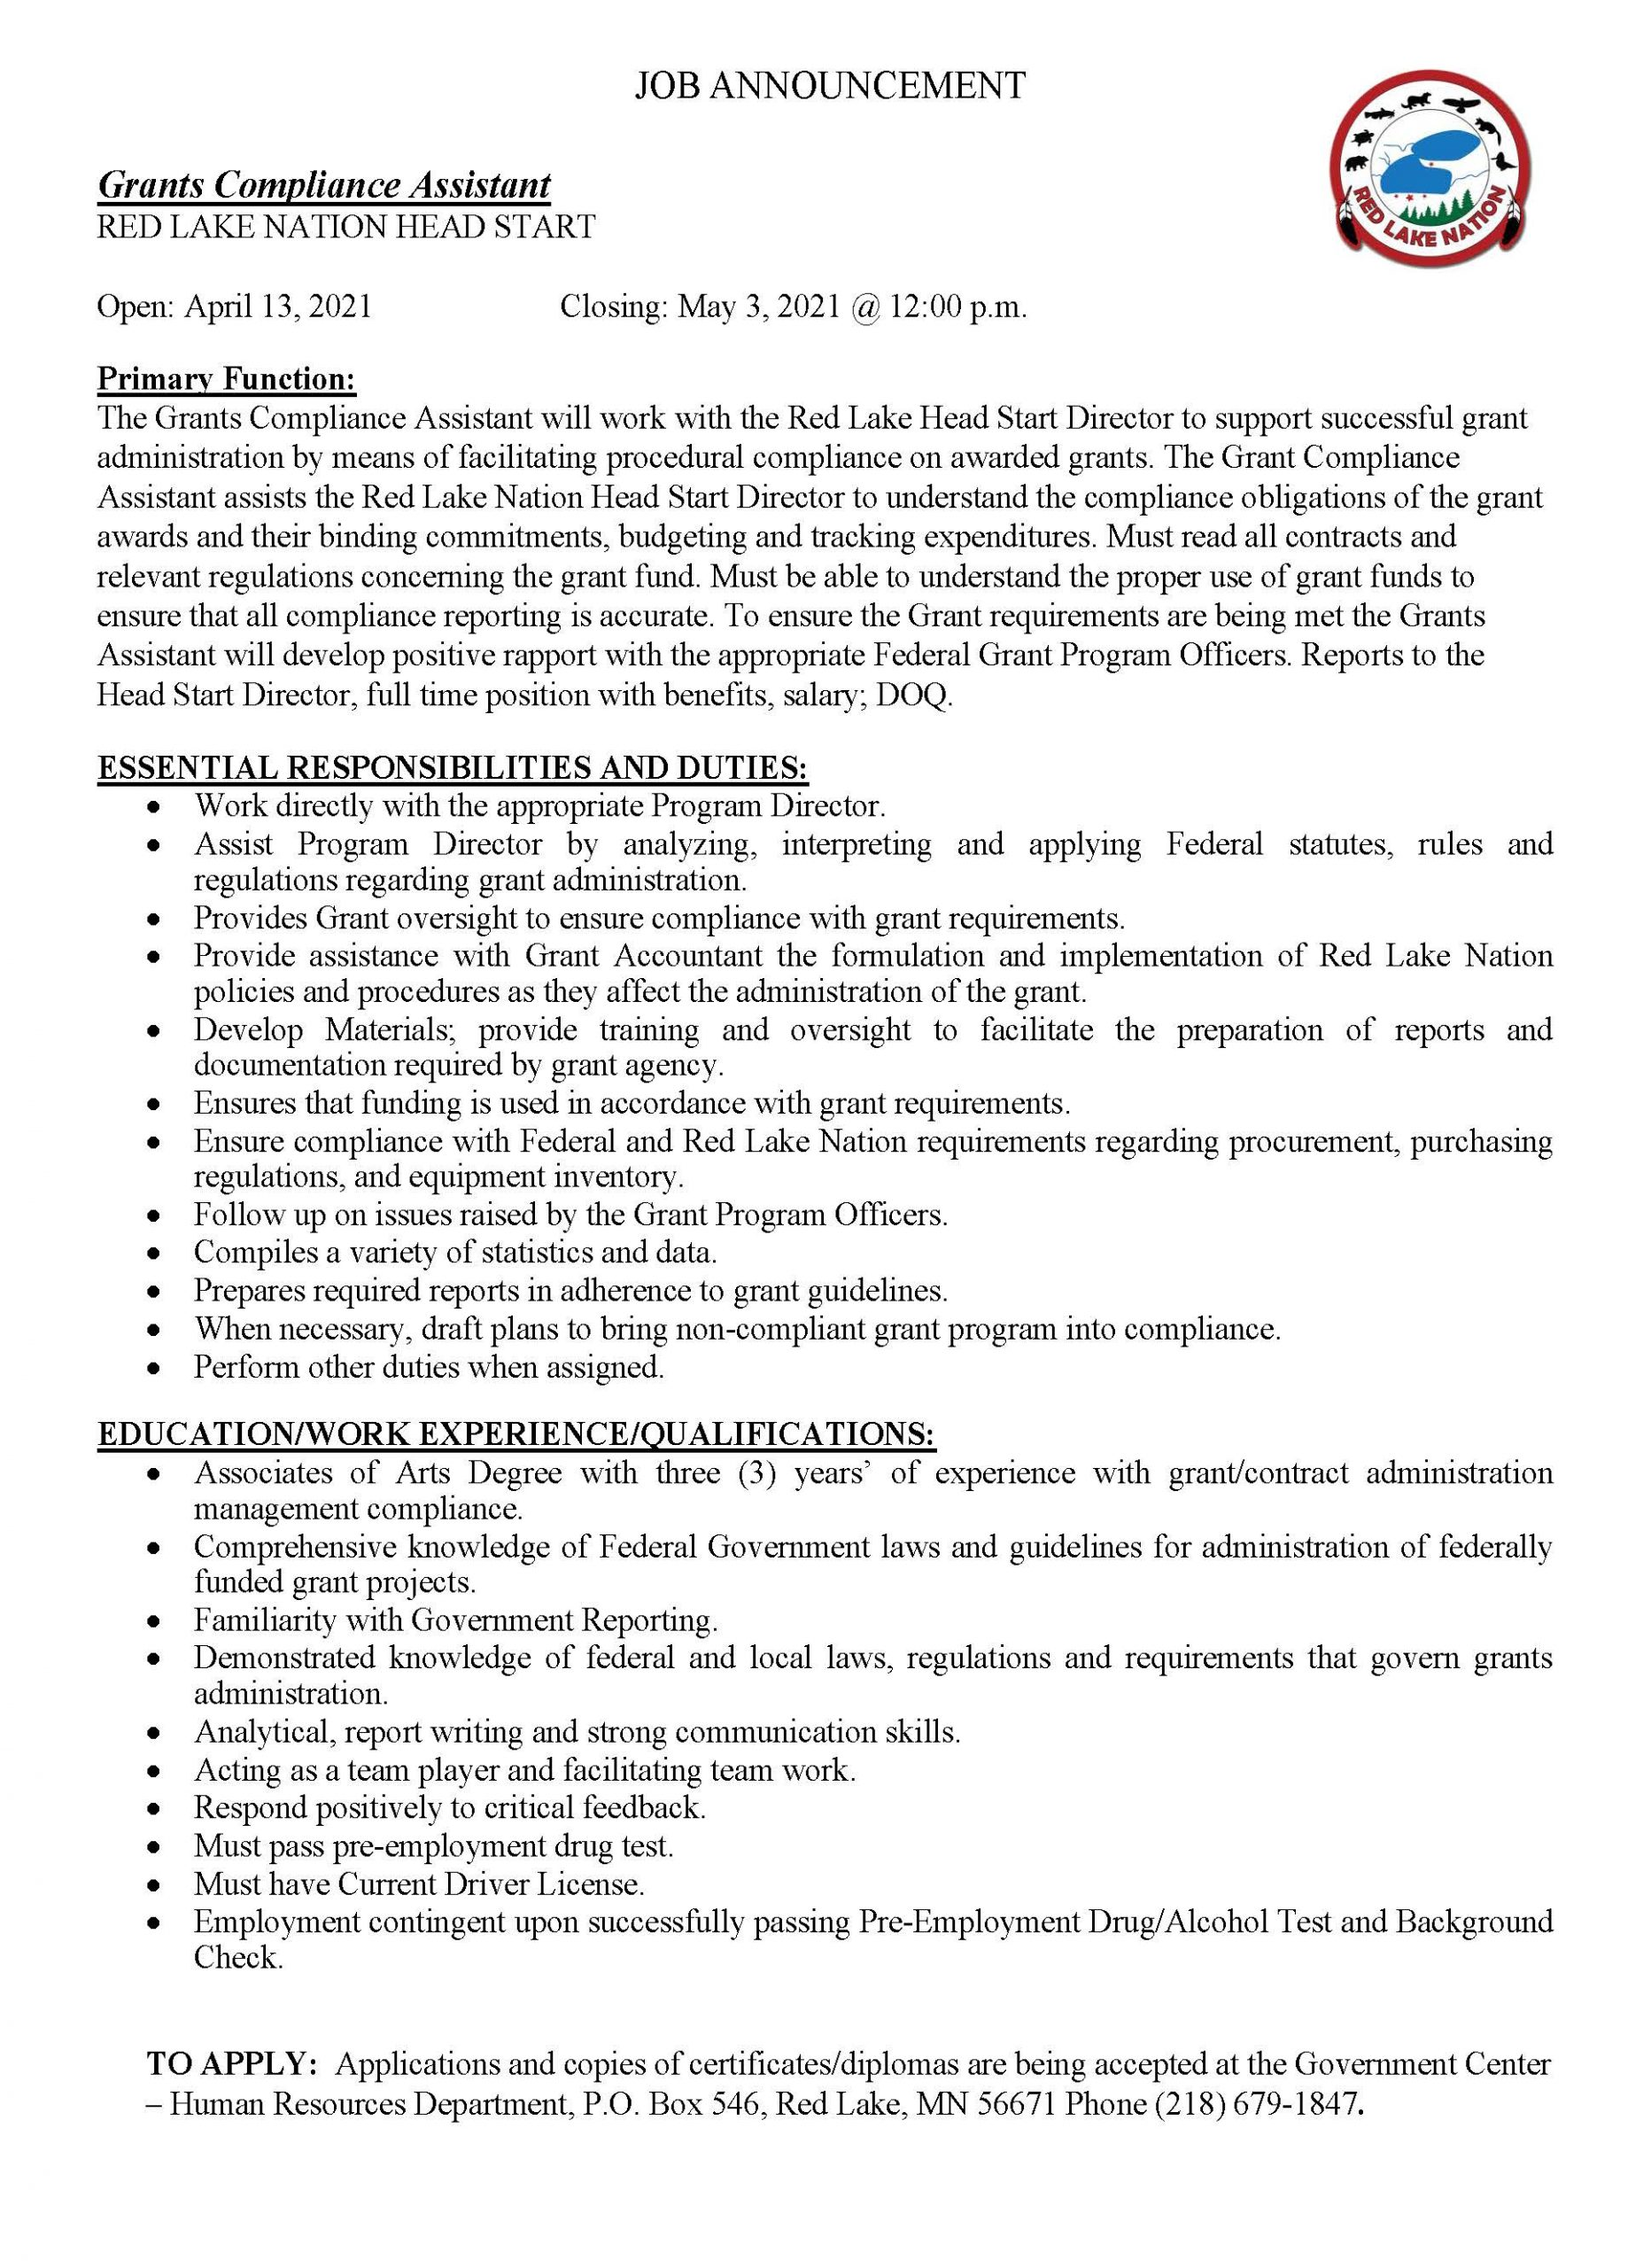 Grants Compliance Assistant-Head Start -Job Posting-4-12-2021